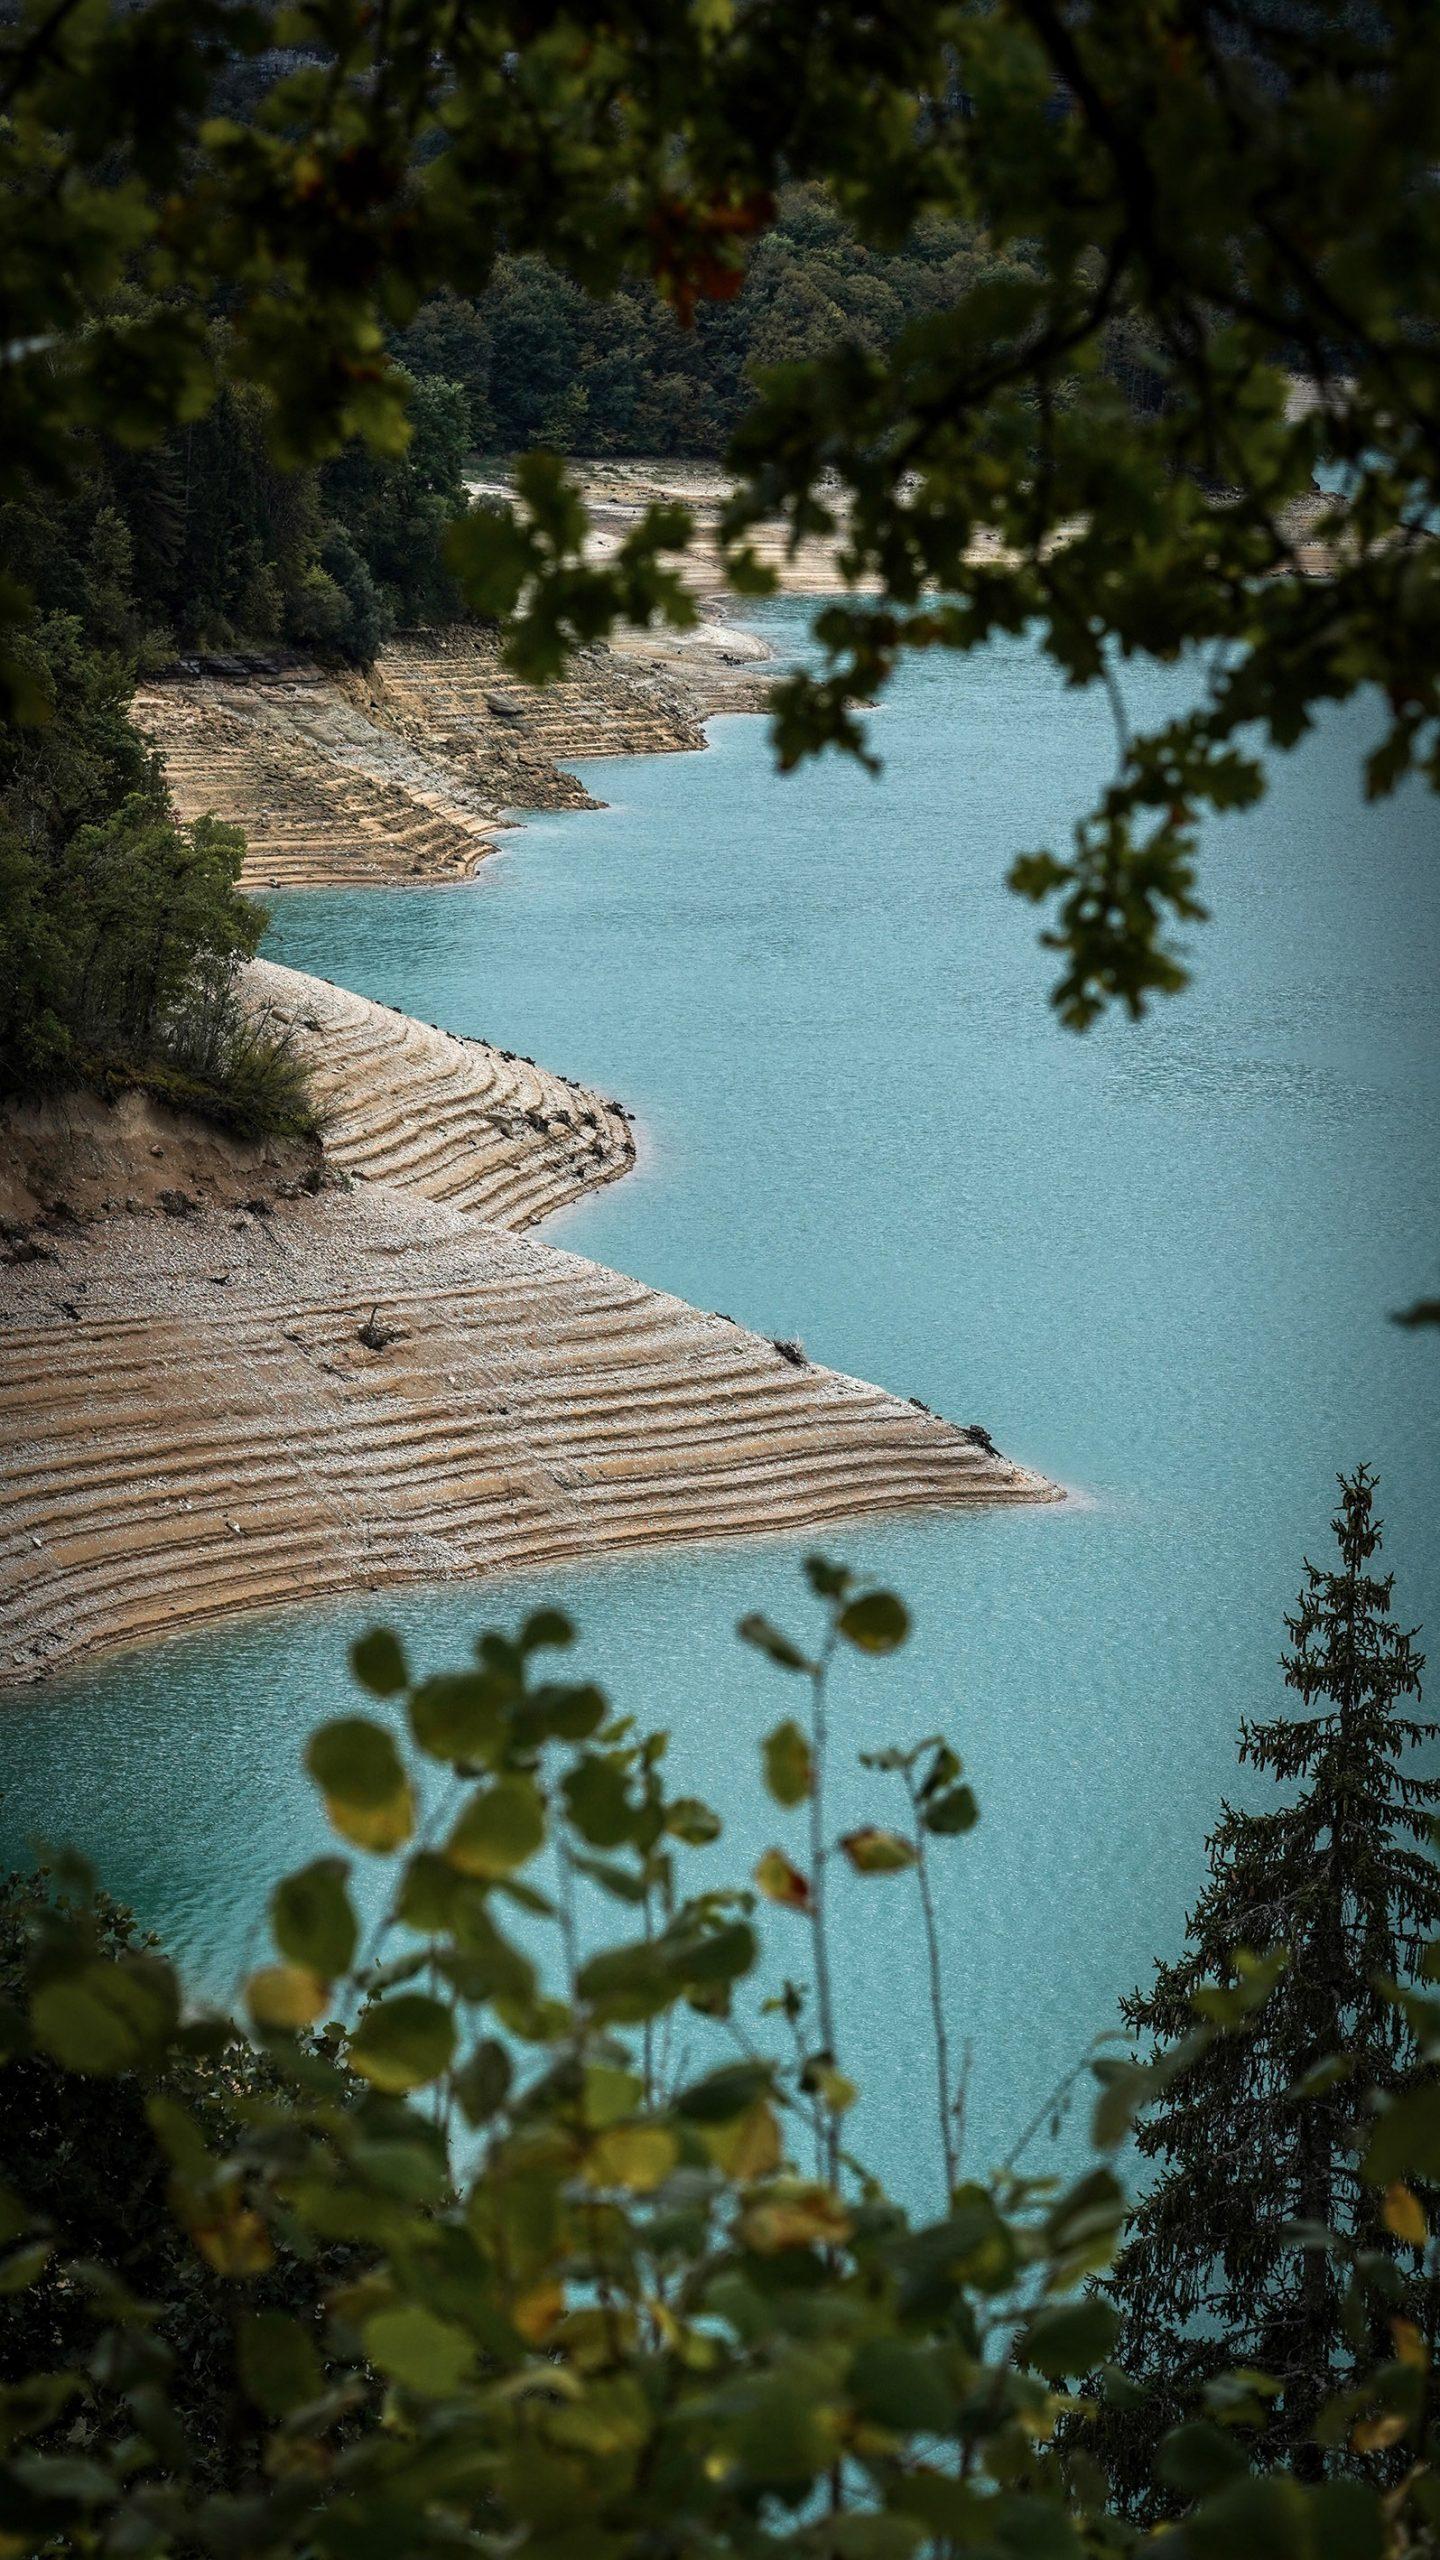 Jura lac de Vouglans arbres cadre